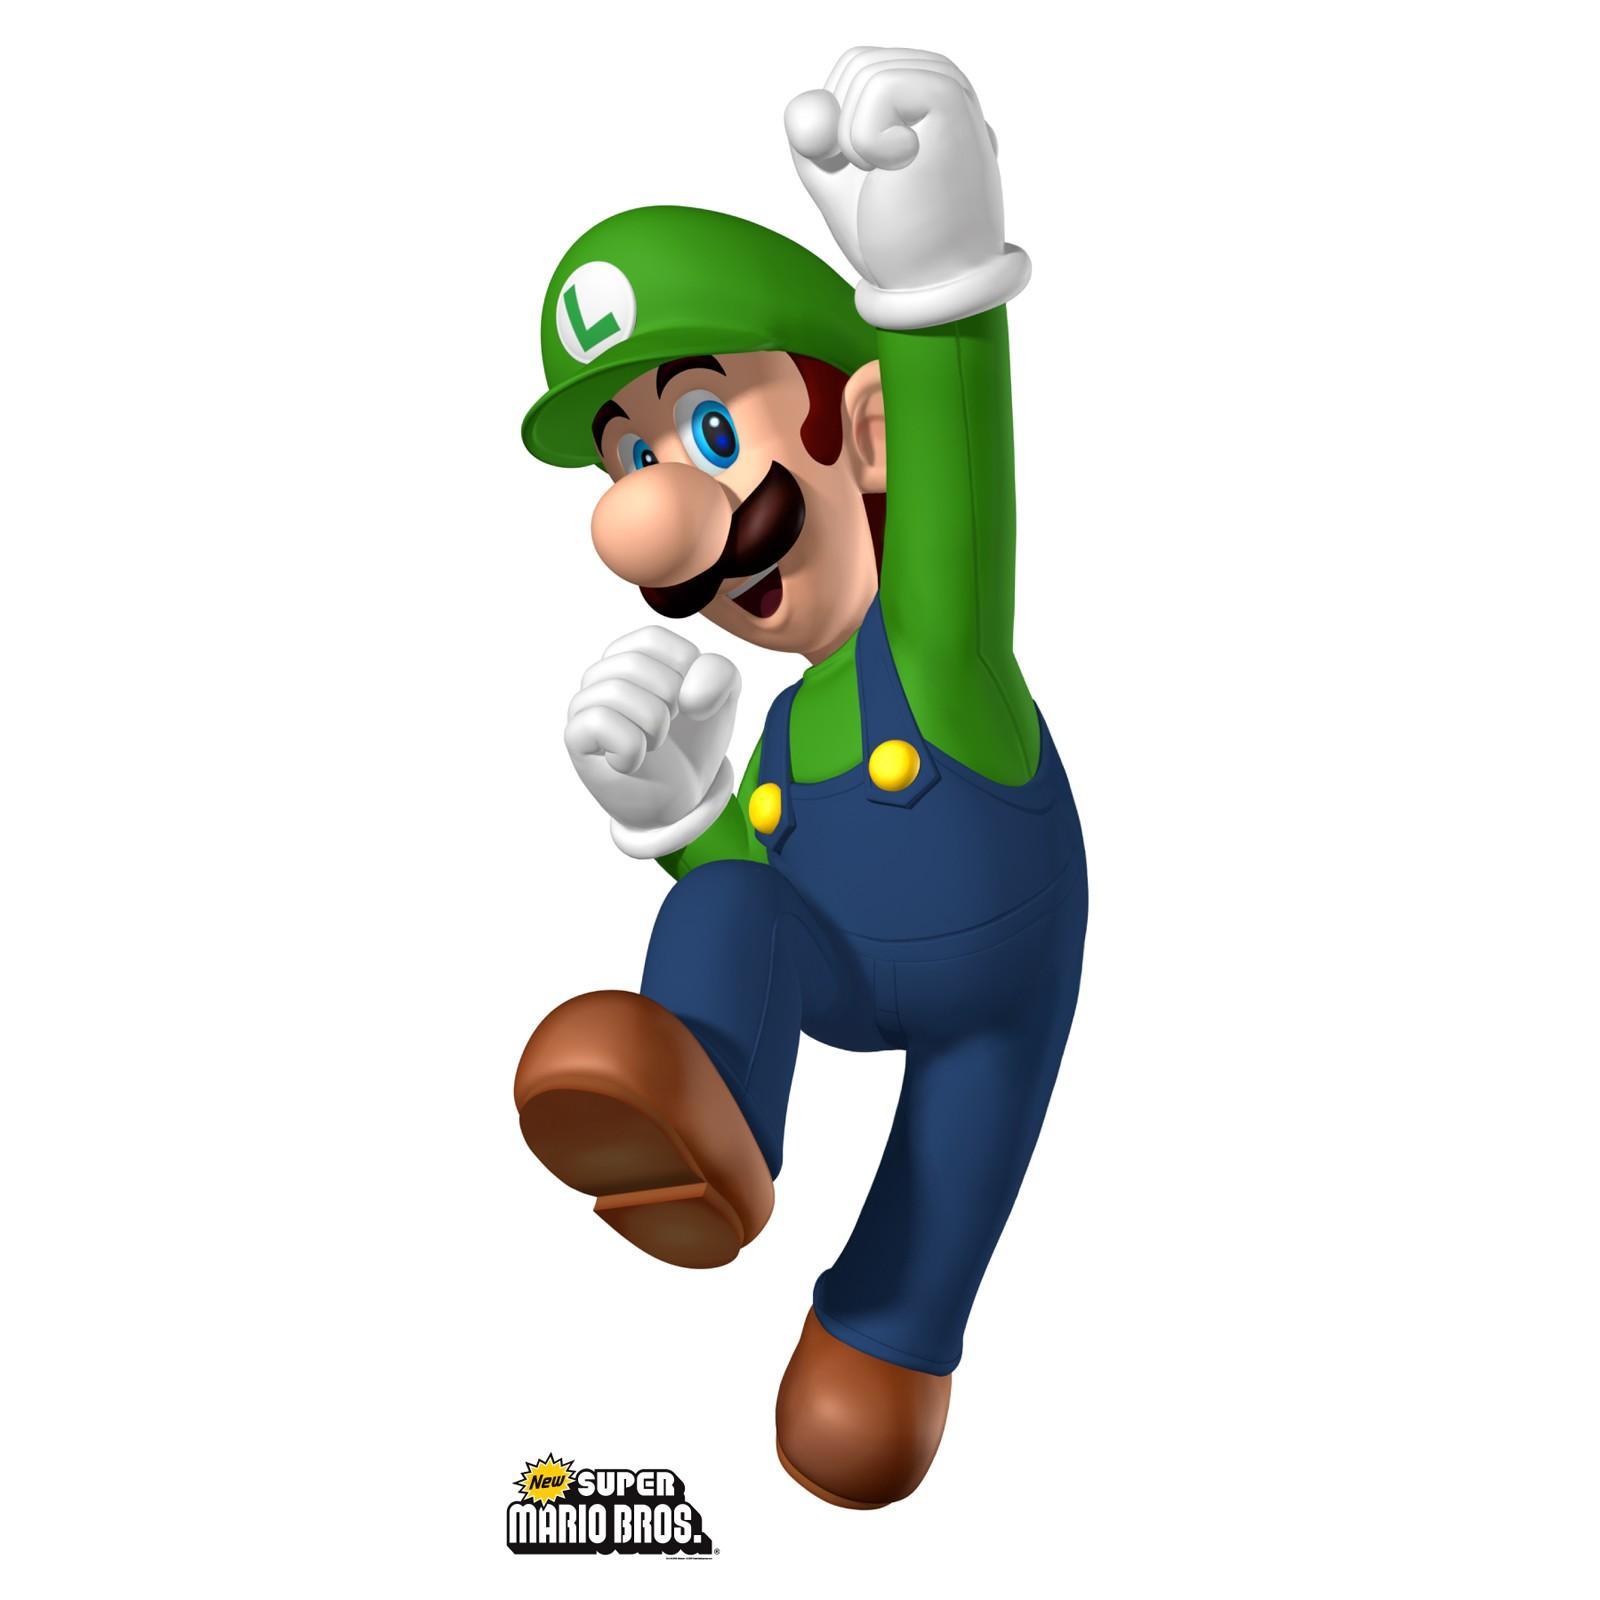 Super Mario Bros: Free Printable Poster. - Oh My Fiesta ...